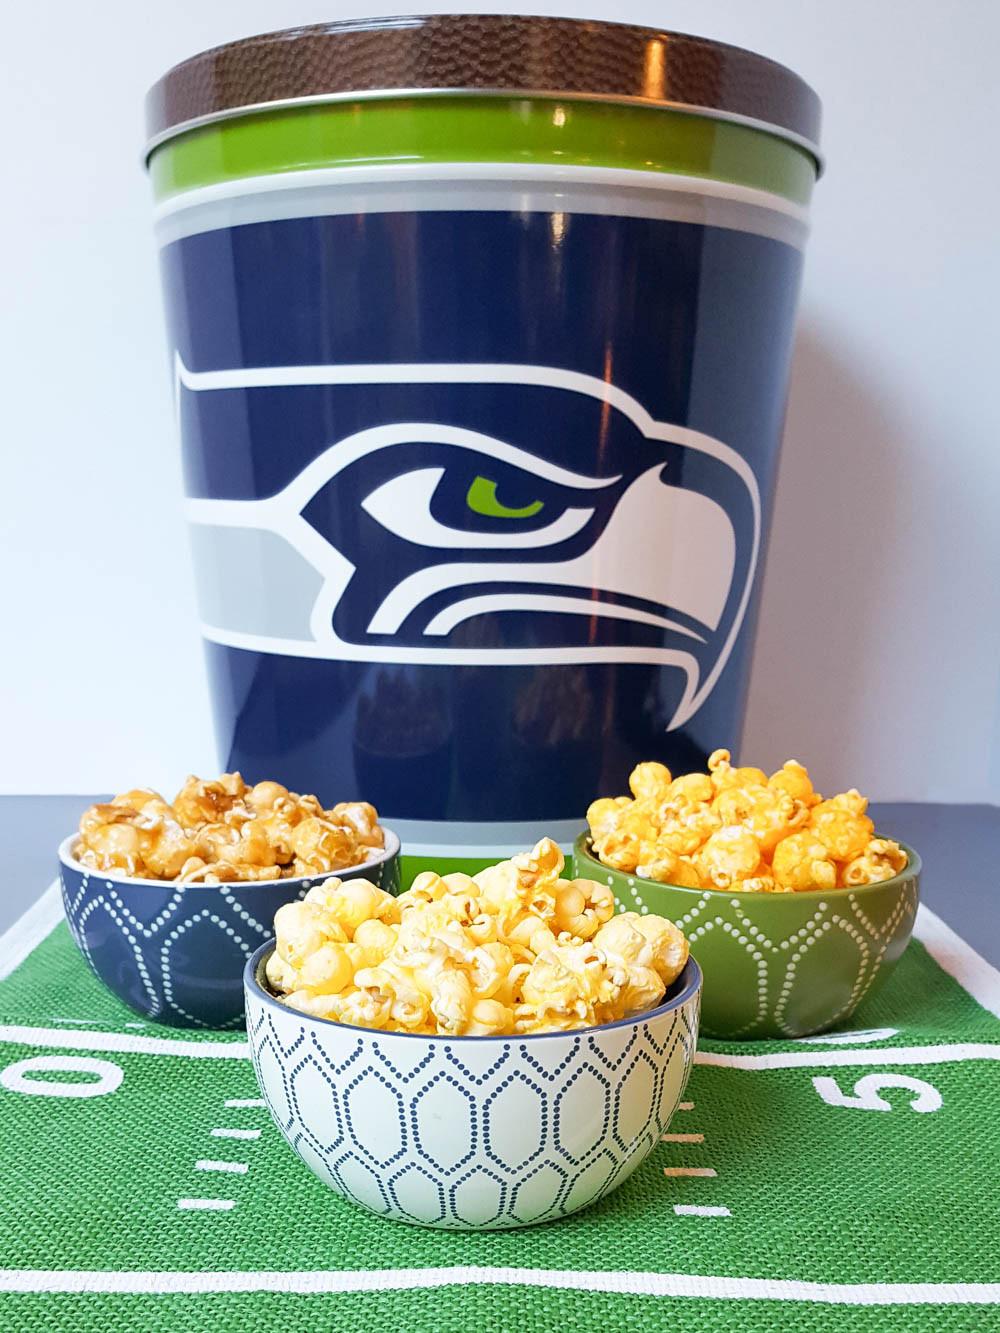 Seahawks Popcorn Snack Ideas _Football Bettys_The Popcorn Factory